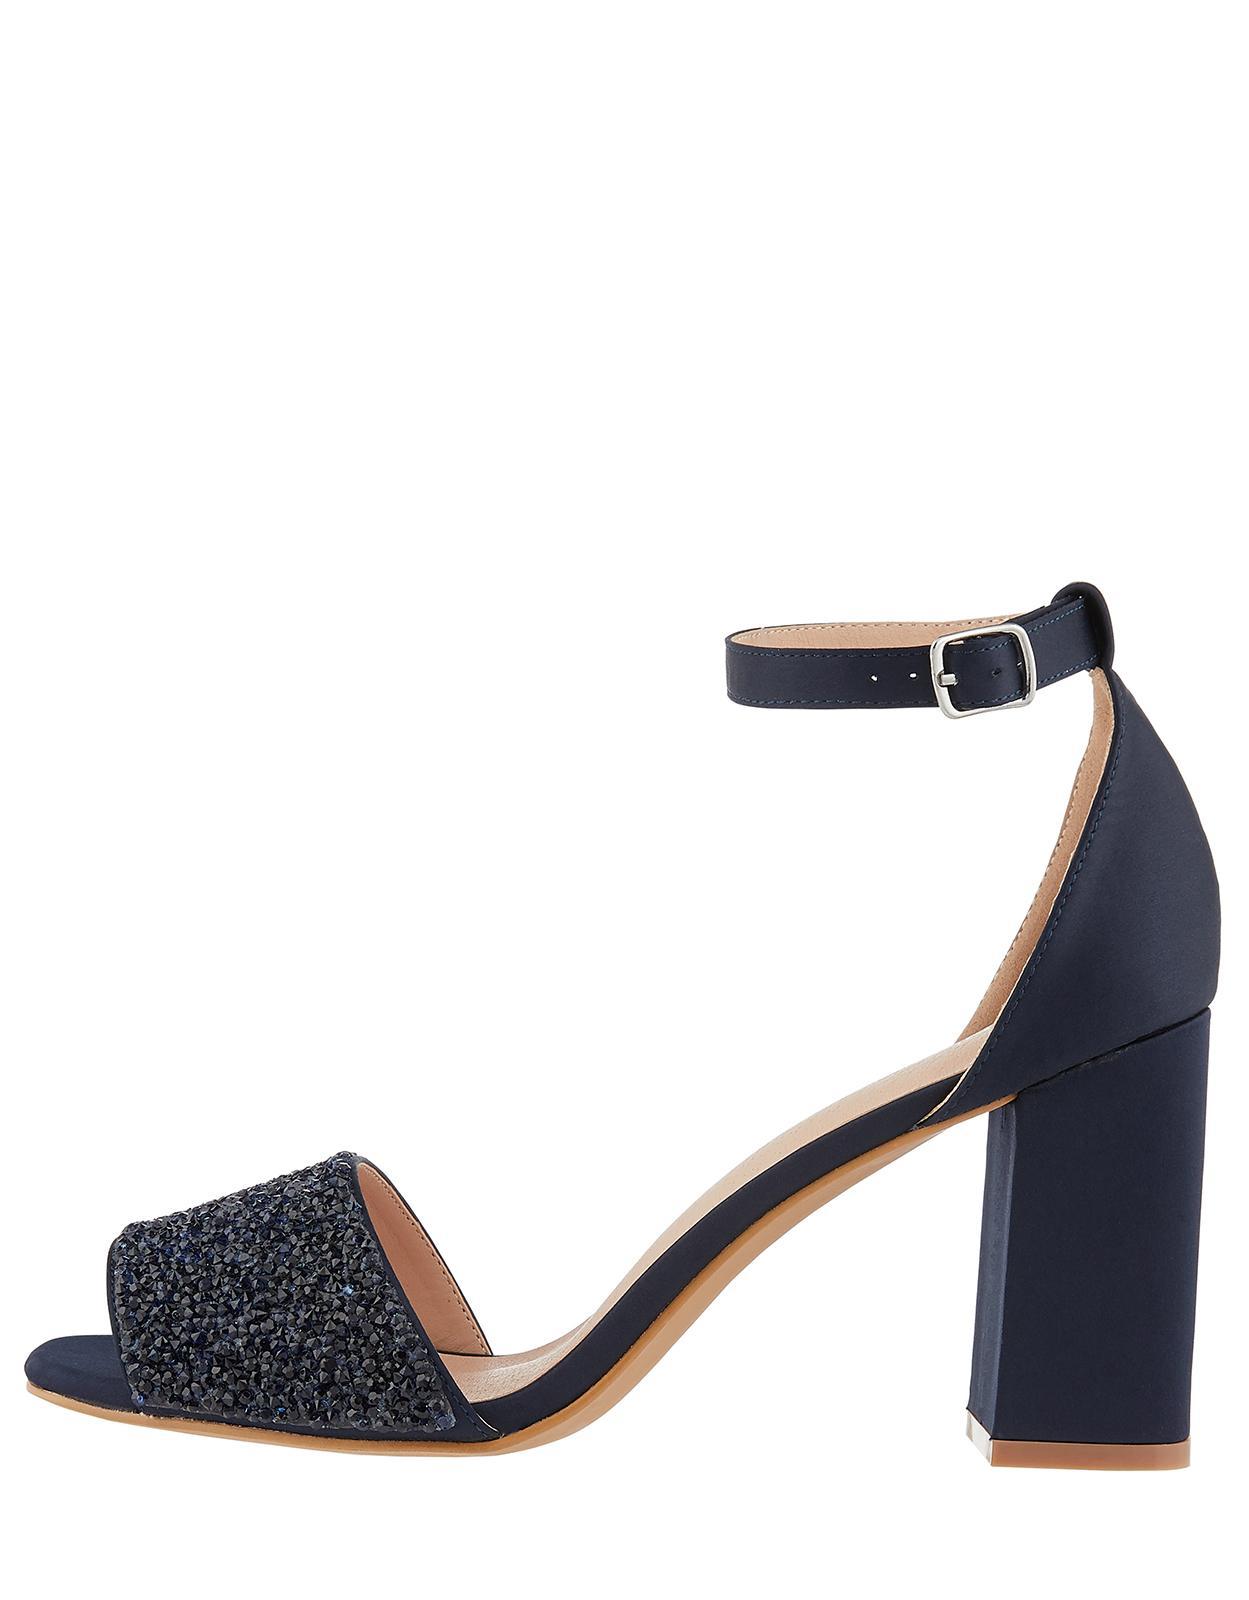 a5b6c963477 Monsoon Sasi Sparkly Vamp Block Heel Sandals in Blue - Lyst